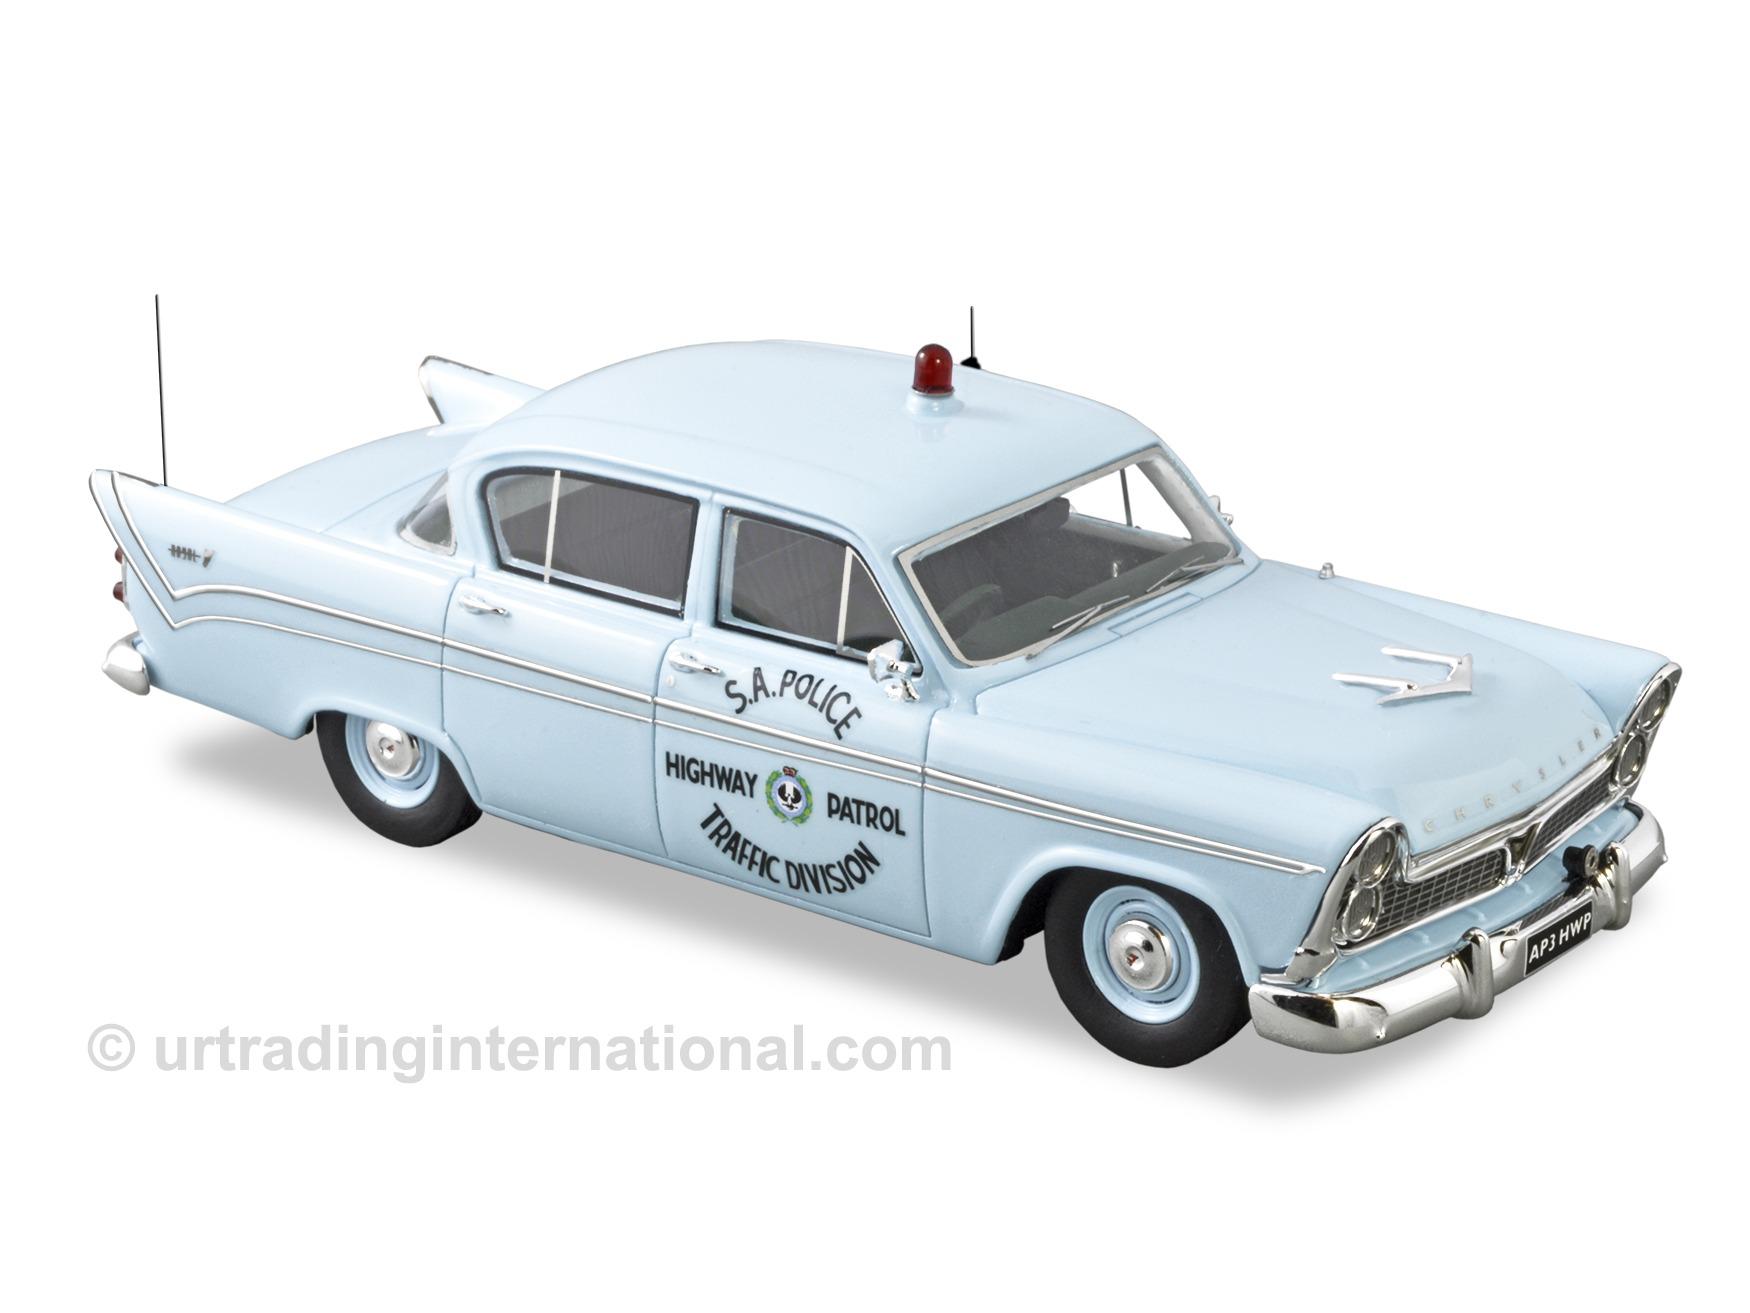 1961 Chrysler AP3 Royal Police Car